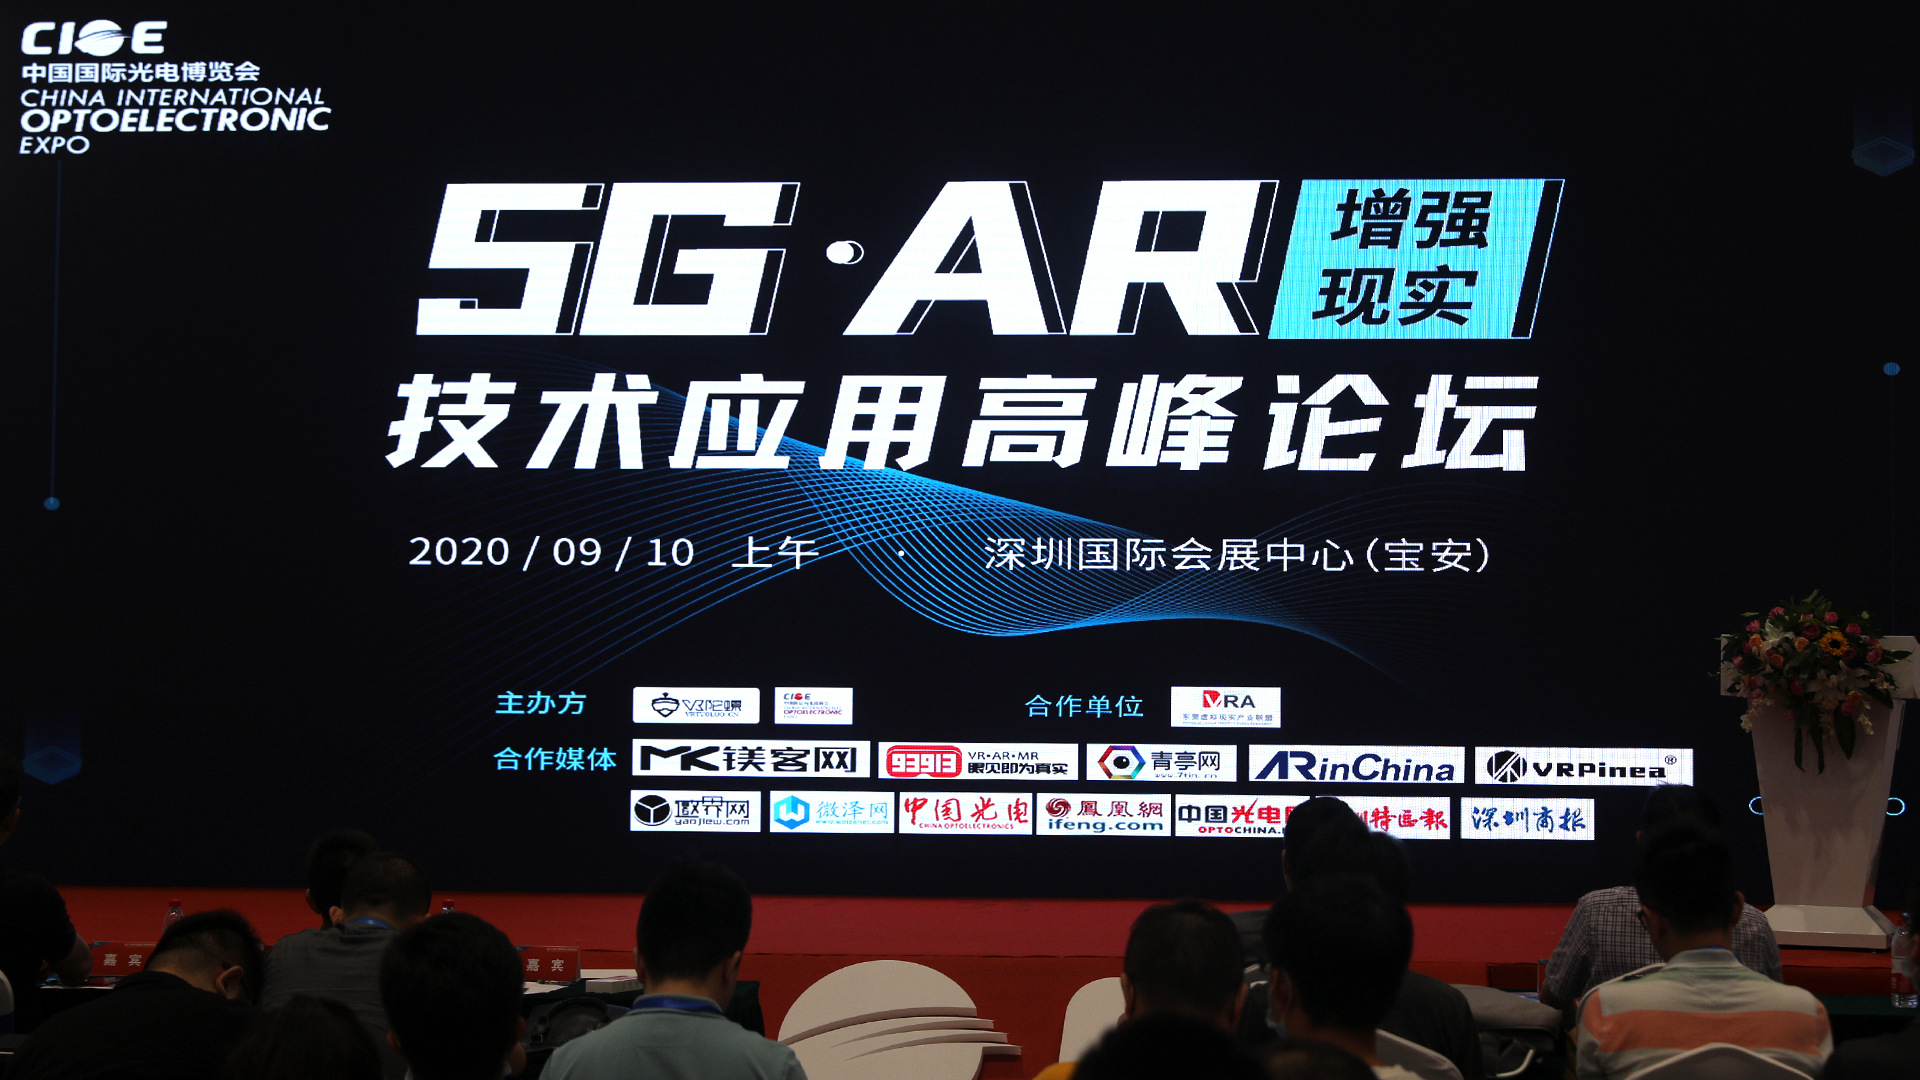 5G·AR(增强现实)技术应用高峰论坛于9月10日圆满落幕